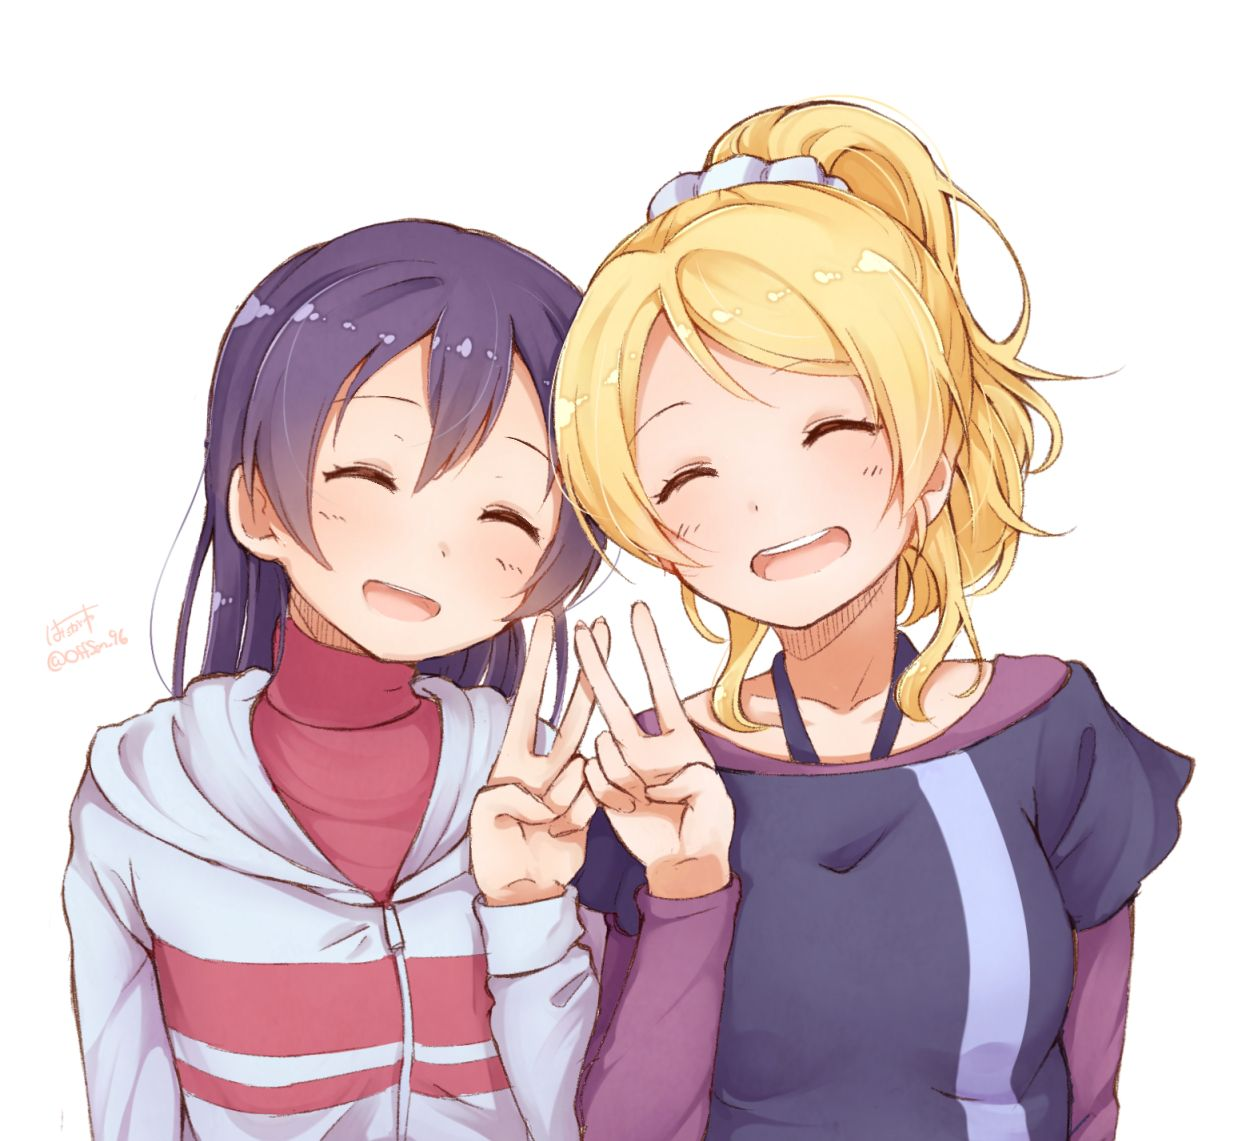 Sonoda Umi and Ayase Eli. Anime, Anime love, Anime images